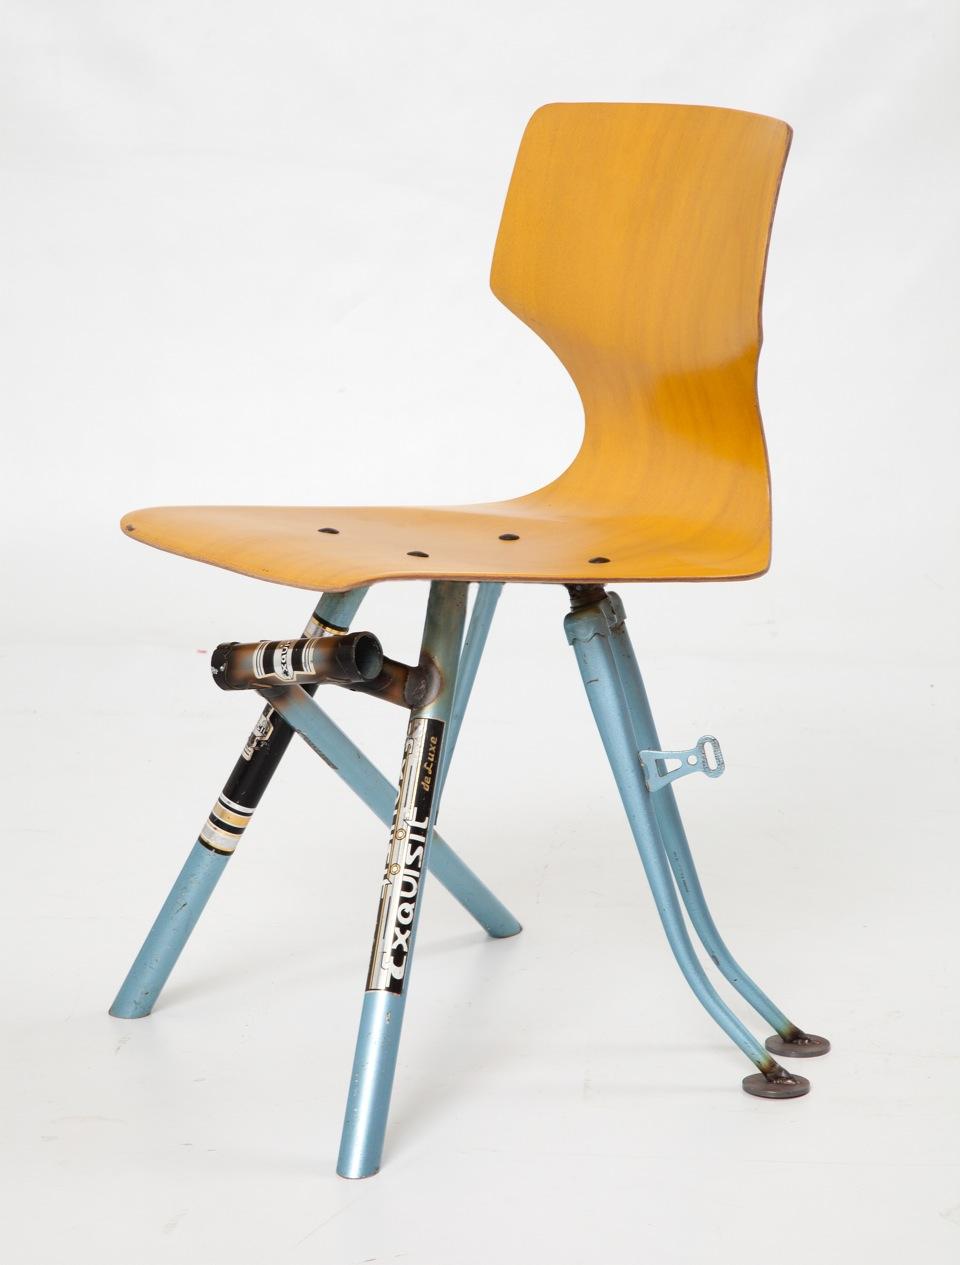 Formsitz Upcycling Design Stuhle Aus Alten Fahrradrahmen Lilli Green